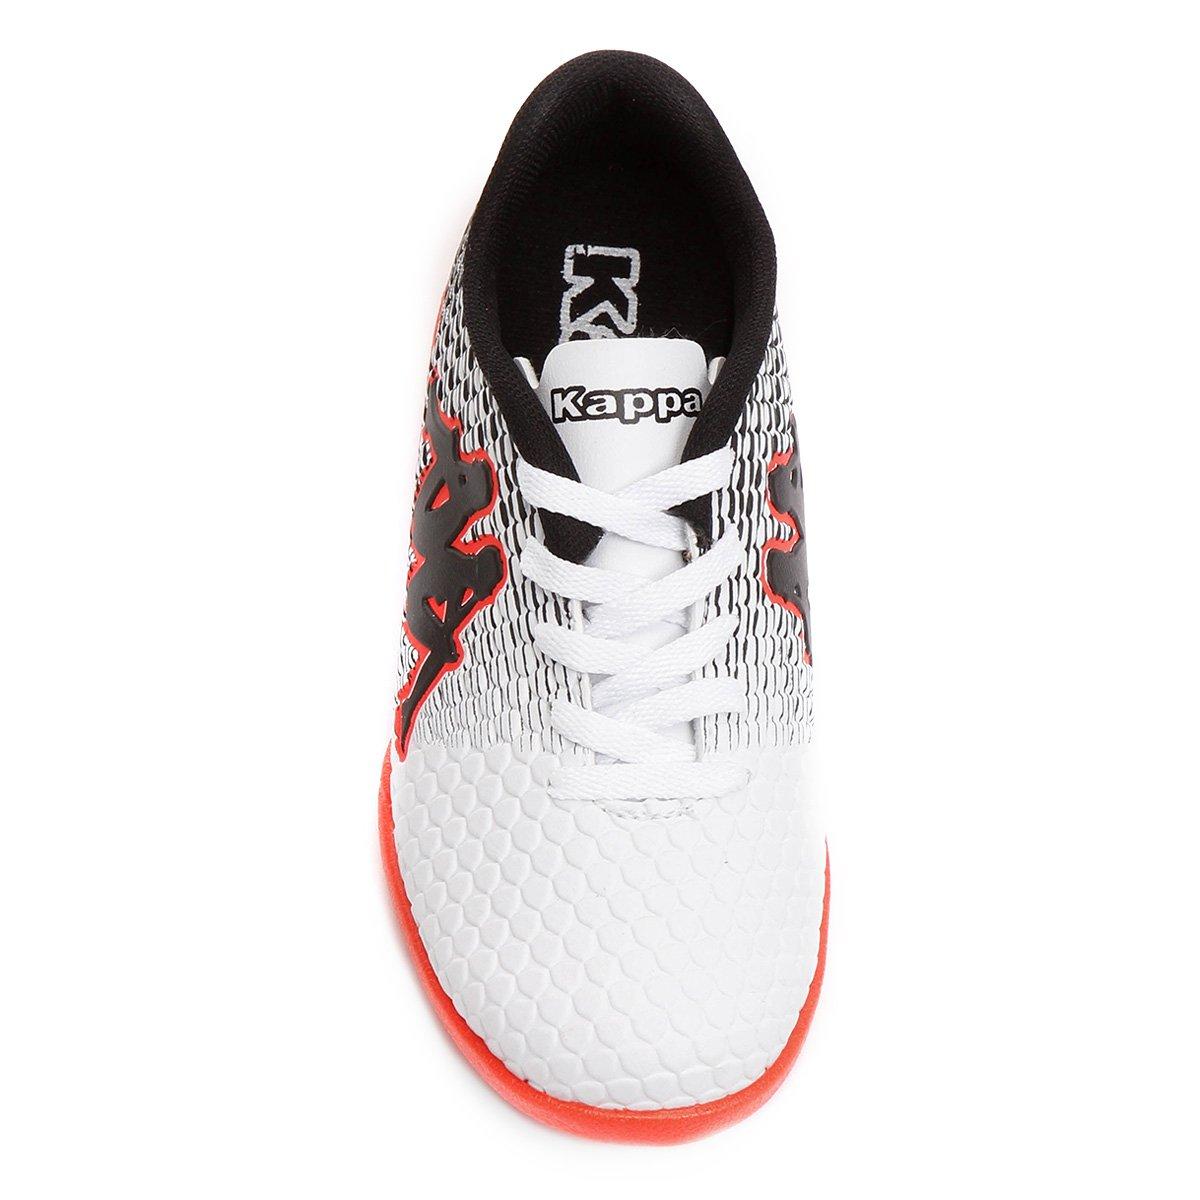 Chuteira Futsal Infantil Kappa Fortore - Compre Agora  ee04e3312f190